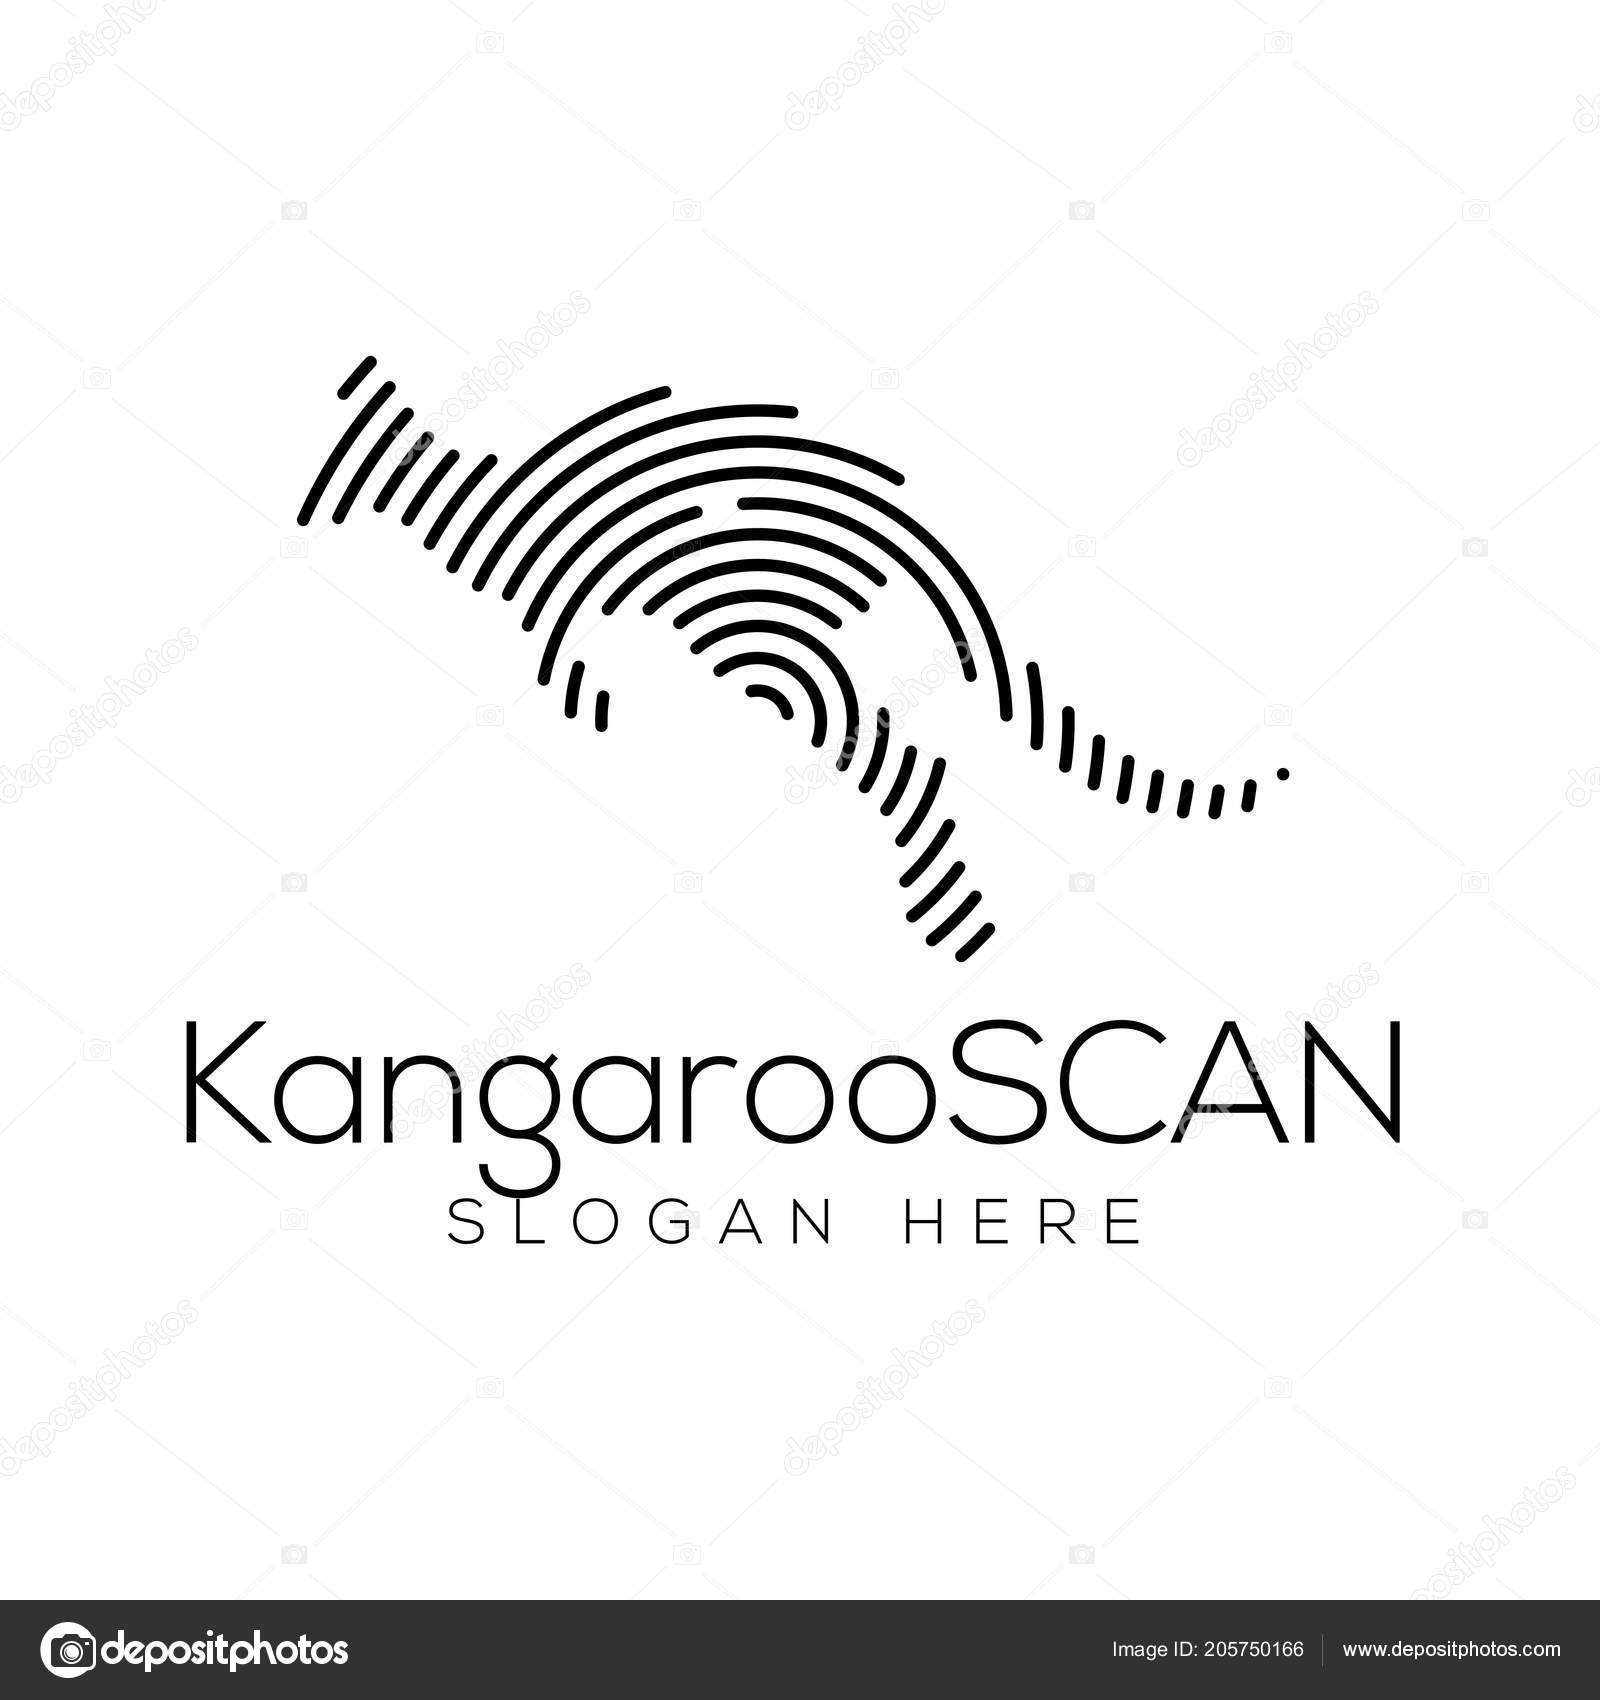 kangaroo scan technology logo vector element animal technology logo